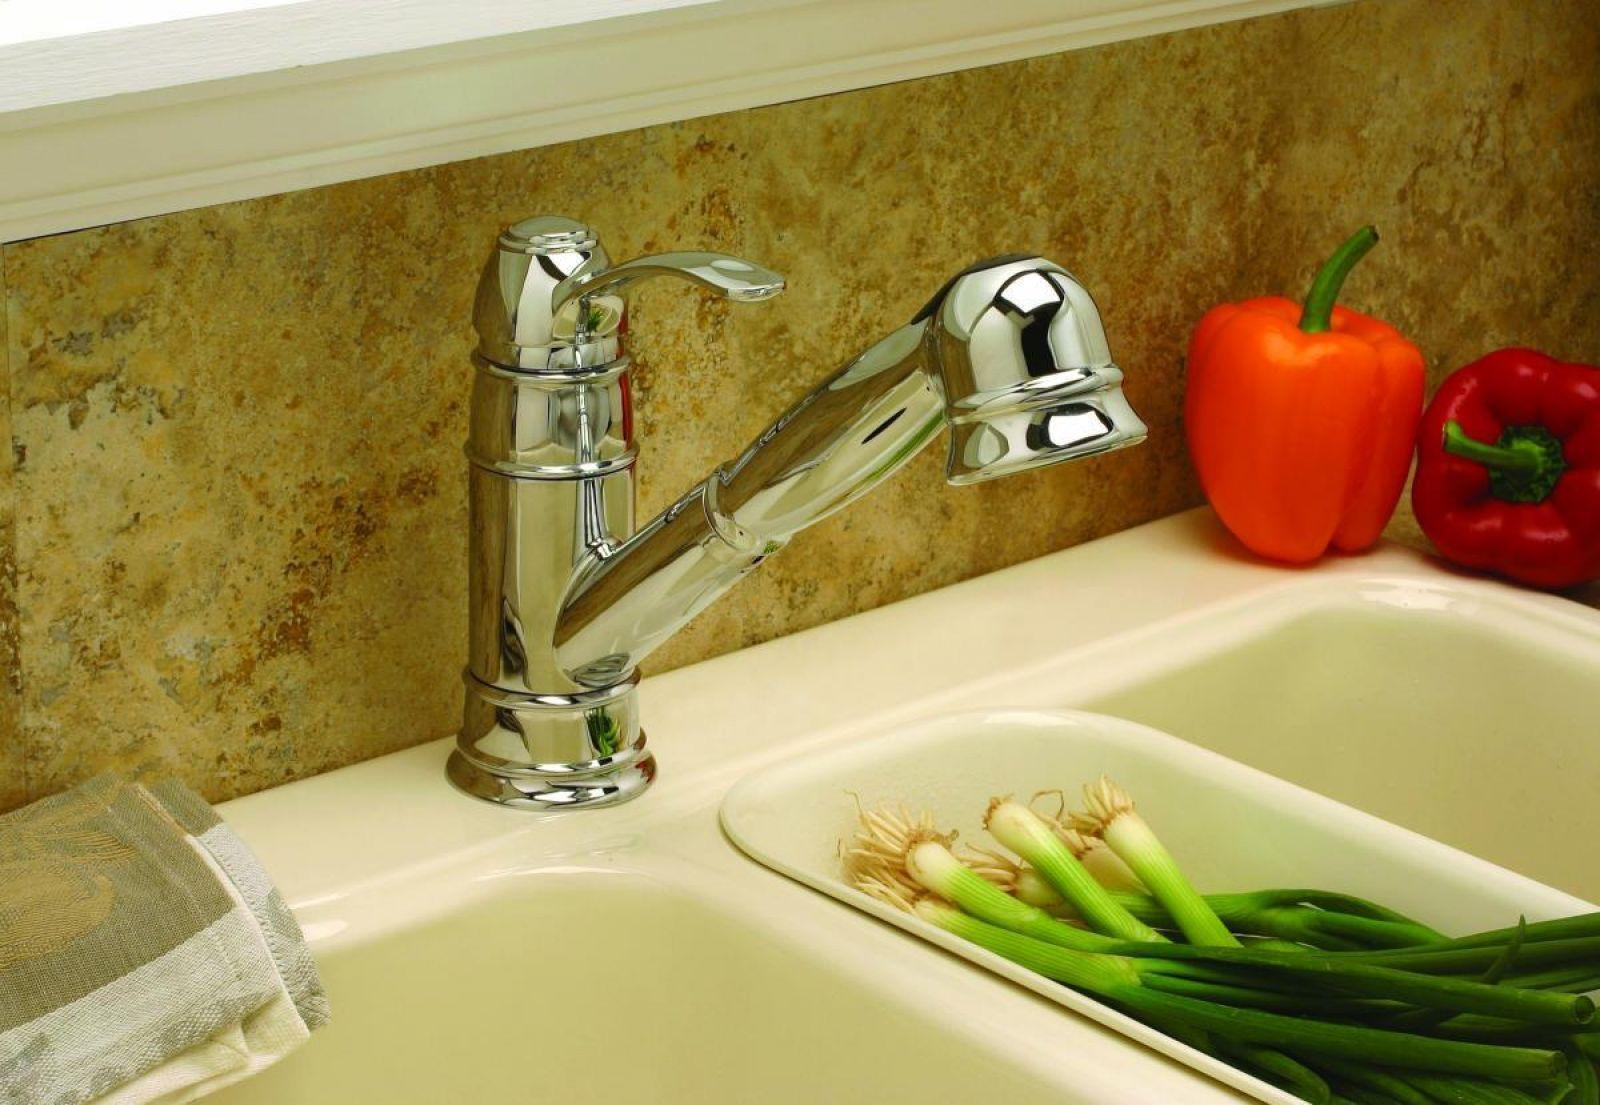 wellington kitchen faucet plumbers atlanta delta plumbing the rh deltaplumbingatlanta com kitchen fixtures atlanta kitchen faucet installation atlanta